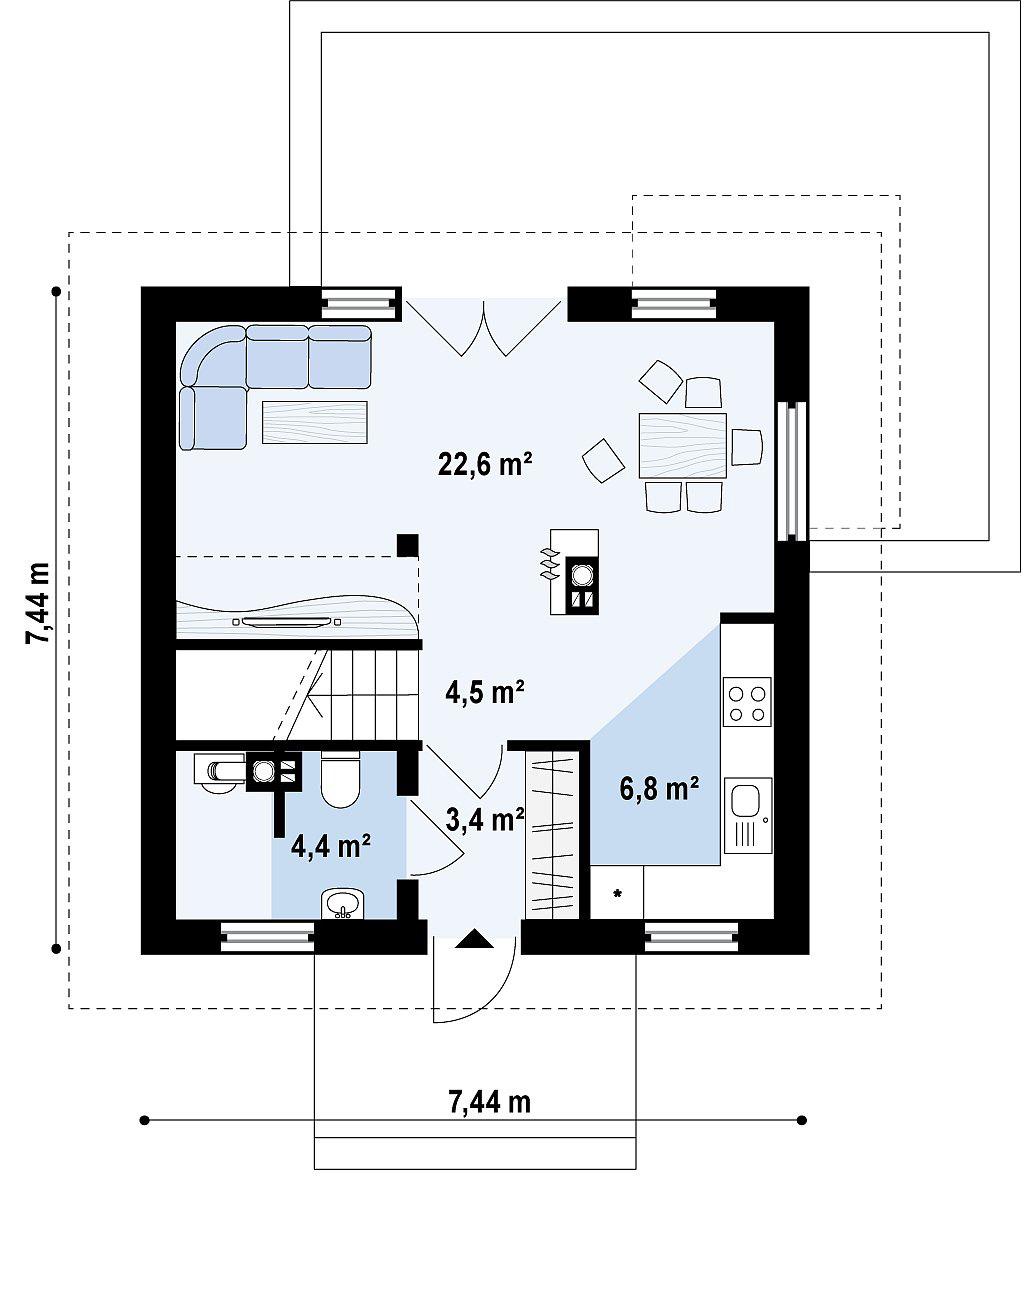 Проект каркасного дома с мансардой в Тюмени m2-110 план